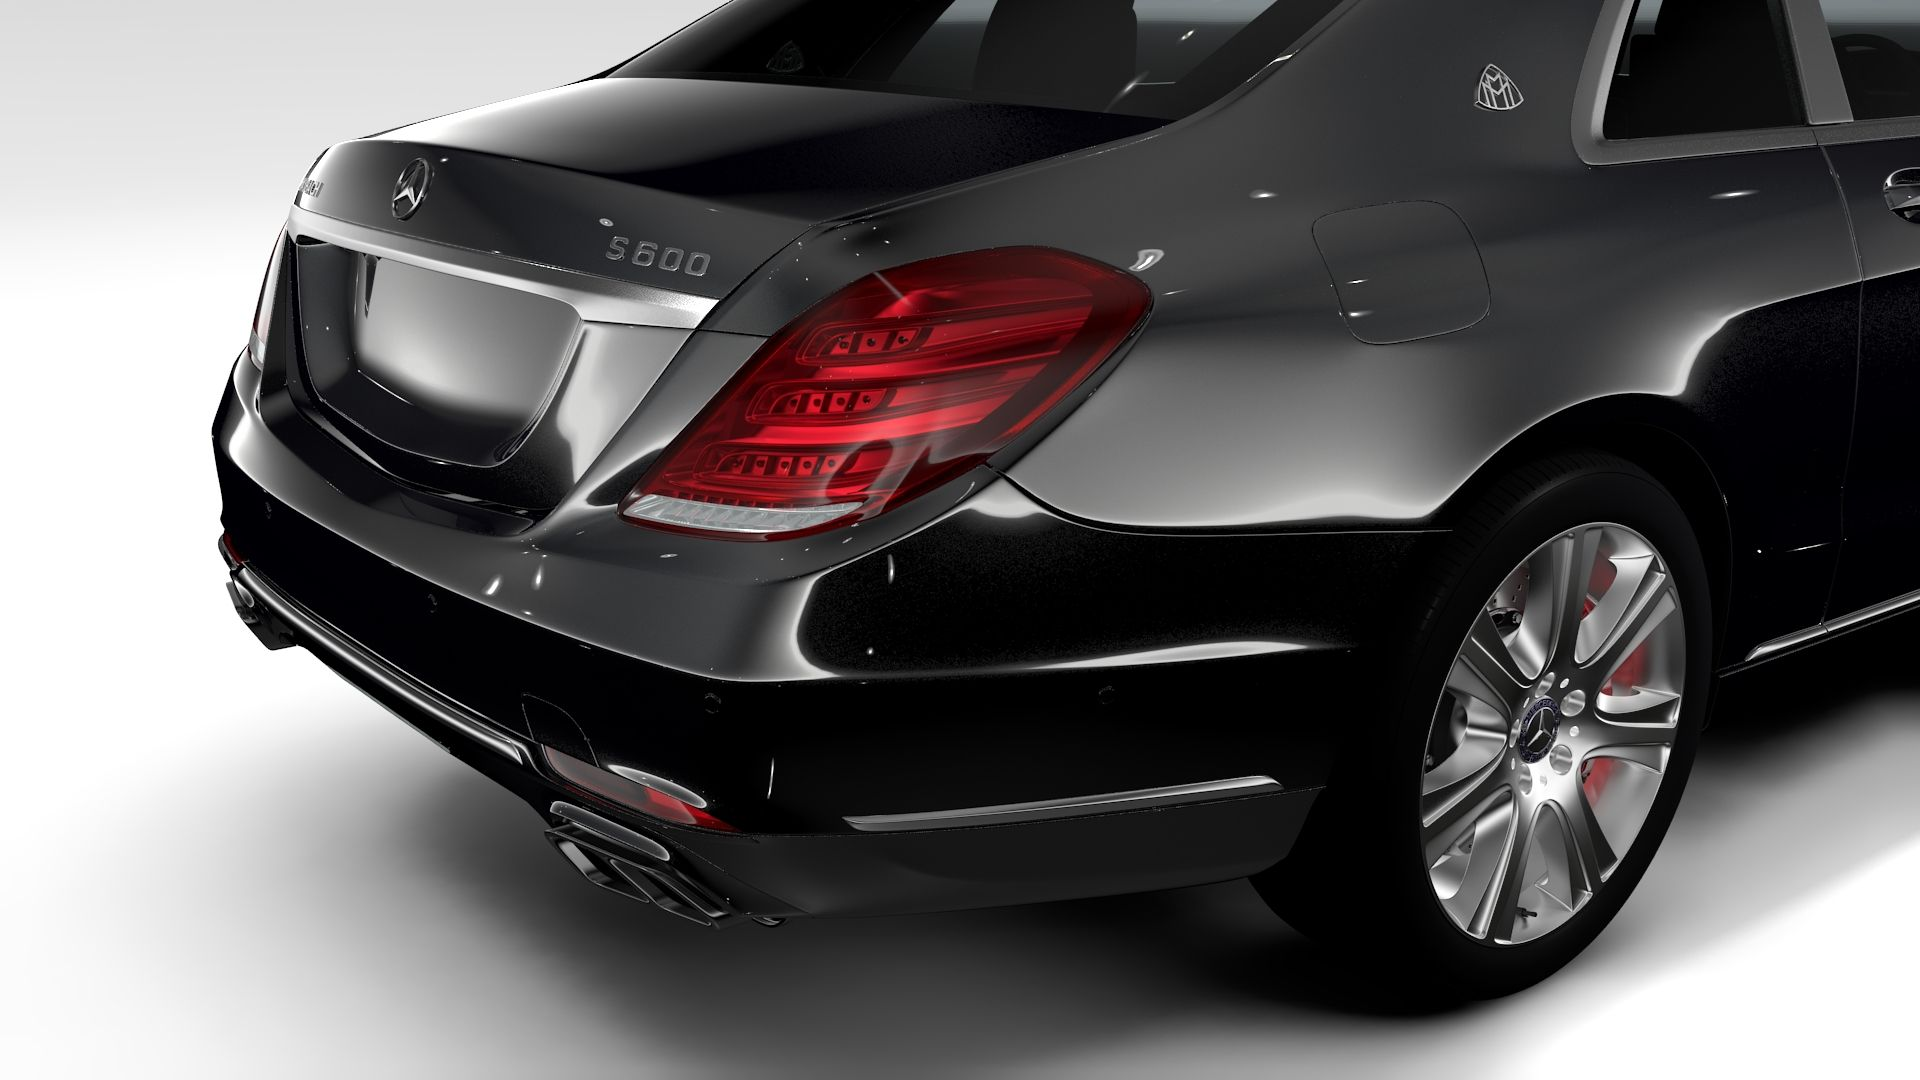 Mercedes Maybach Pullman Guard 2017 Benz s, Mercedes